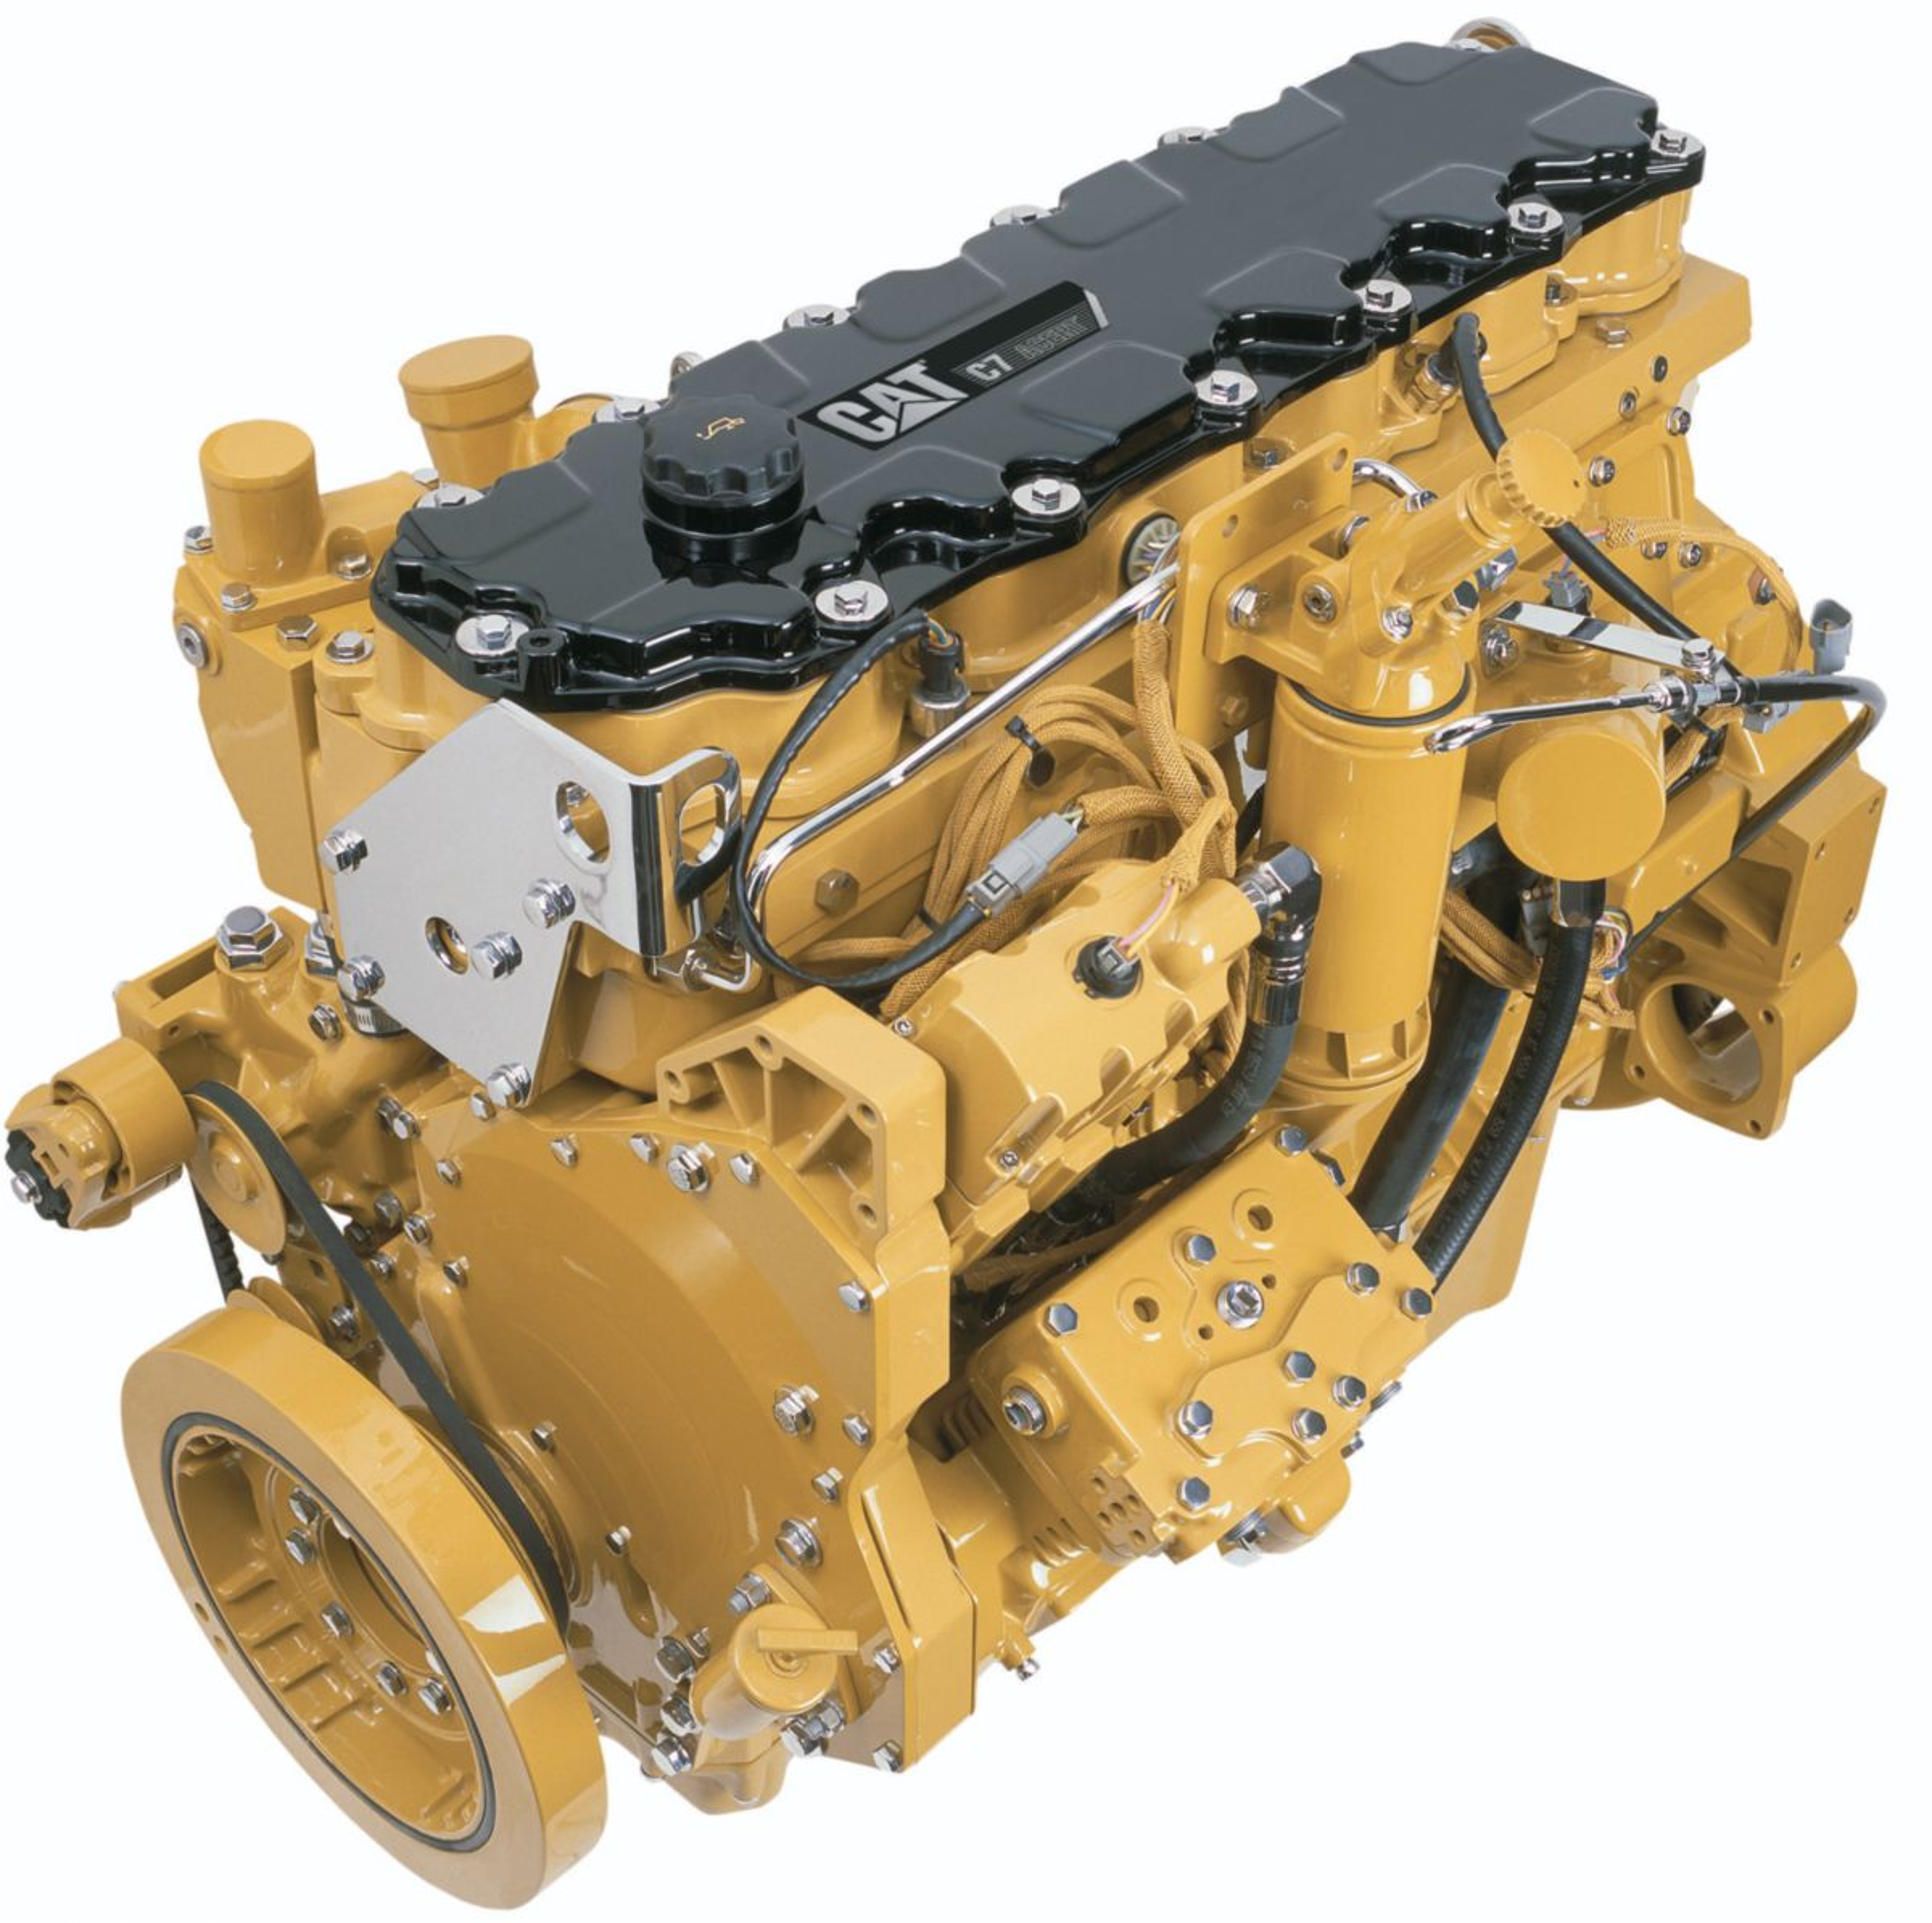 Cat 3126 Fuel Pump Diagram Wiring Engine New 140m Motor Grader For Sale Whayne Location Caterpillar